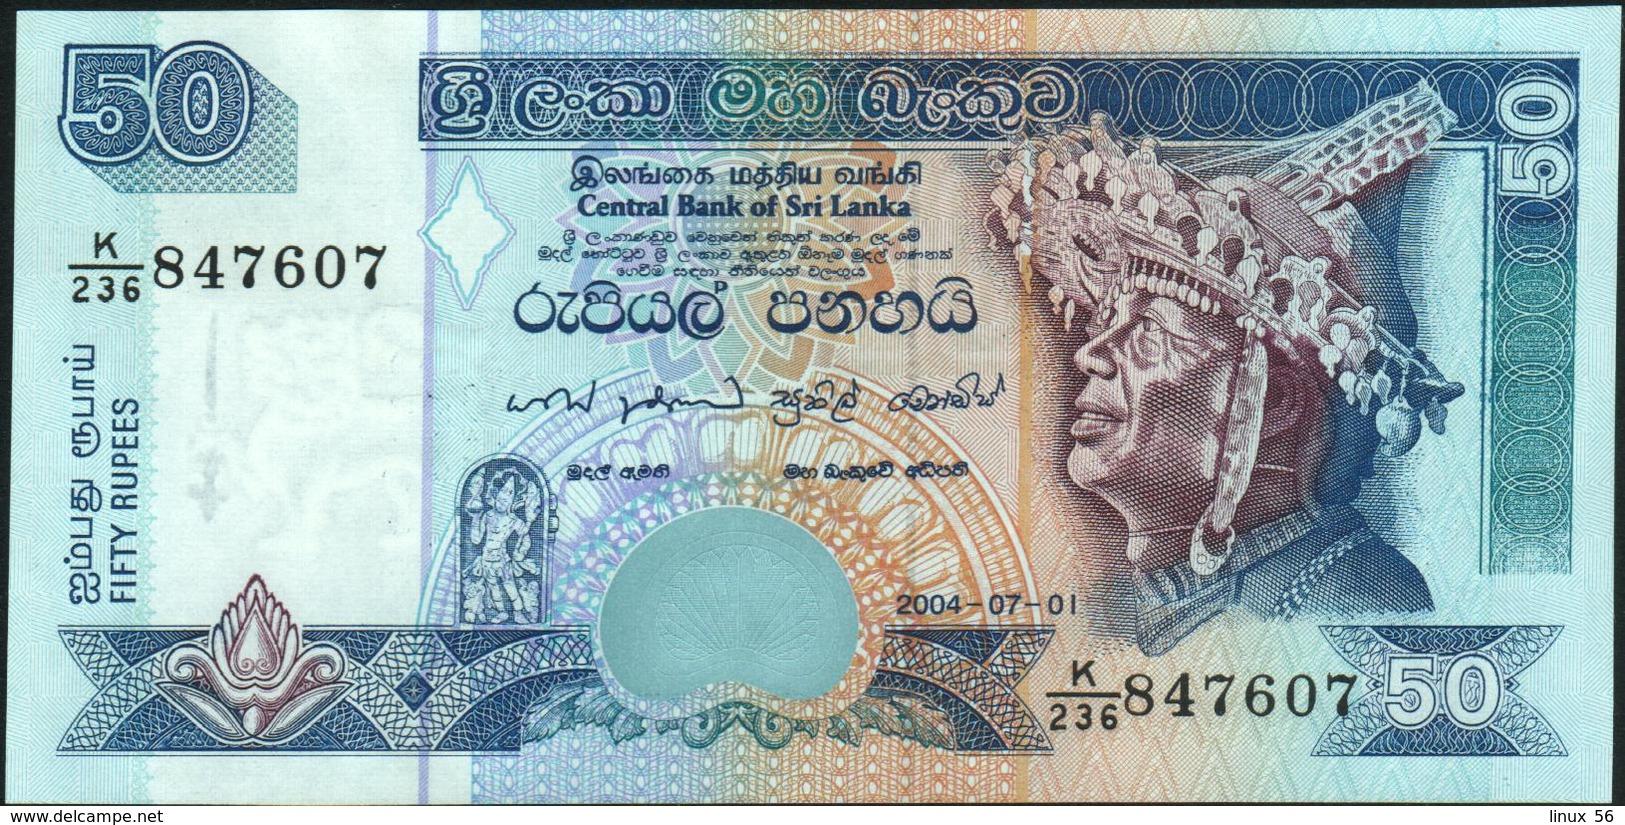 CEYLON & SRI LANKA - 50 Rupees 01.07.2004 UNC P.117 C - Sri Lanka